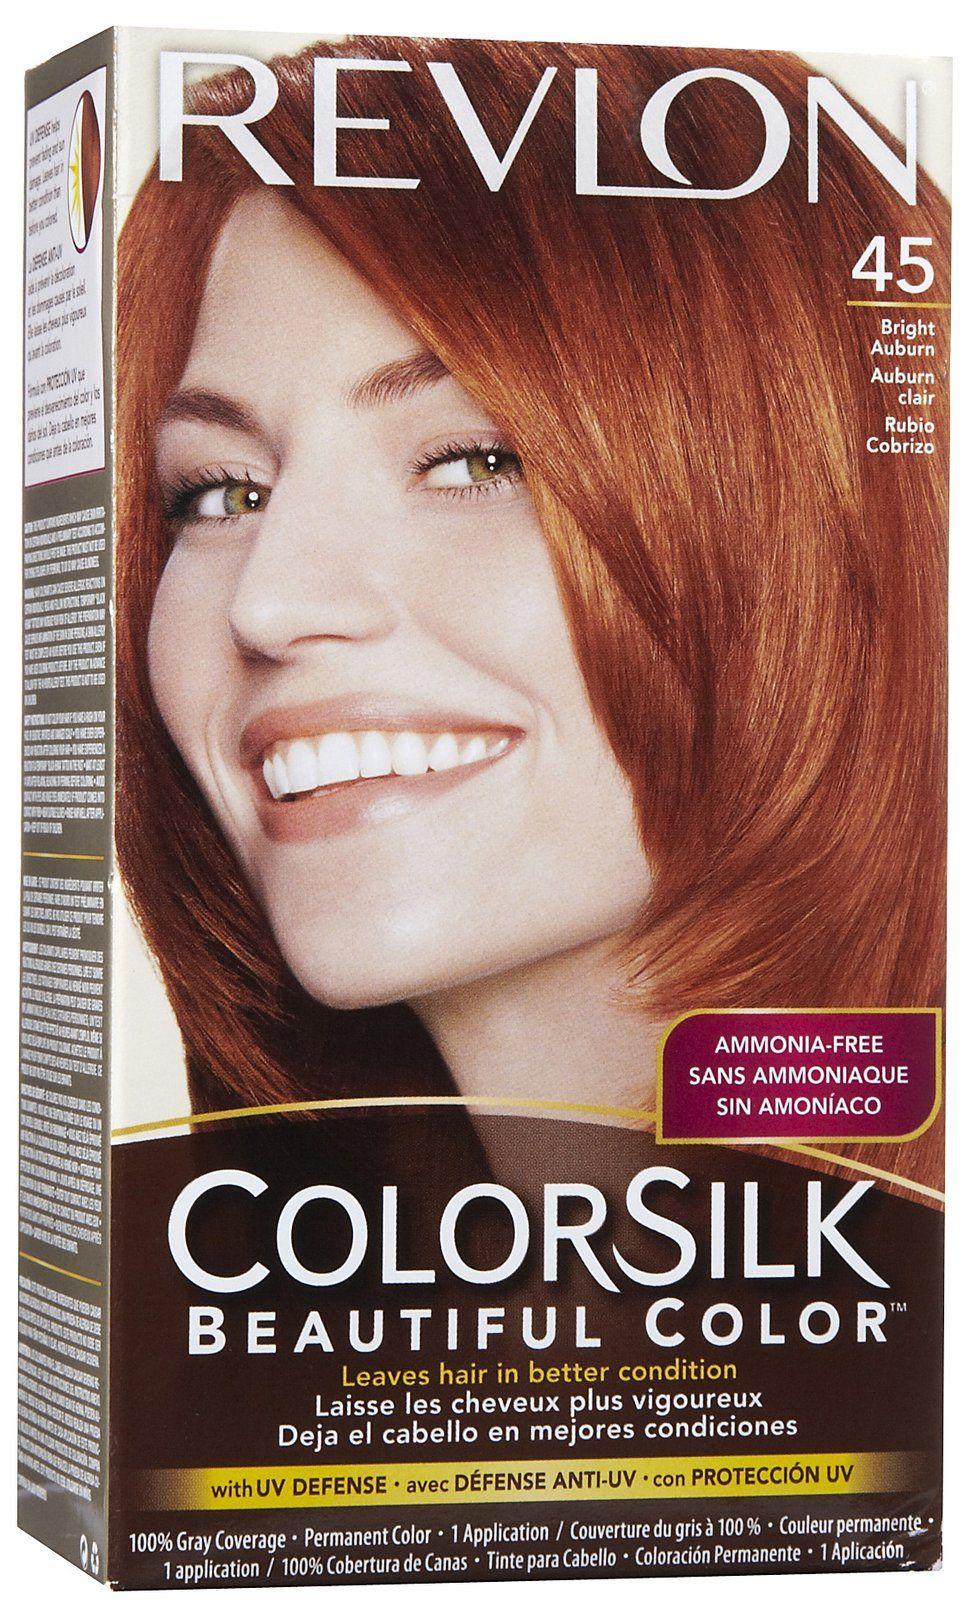 Colorsilk beautiful color 55 light reddish brown by revlon hair color - Revlon Colorsilk Permanent Hair Color Vibrant Red Best Price Bright Auburn Copper Red